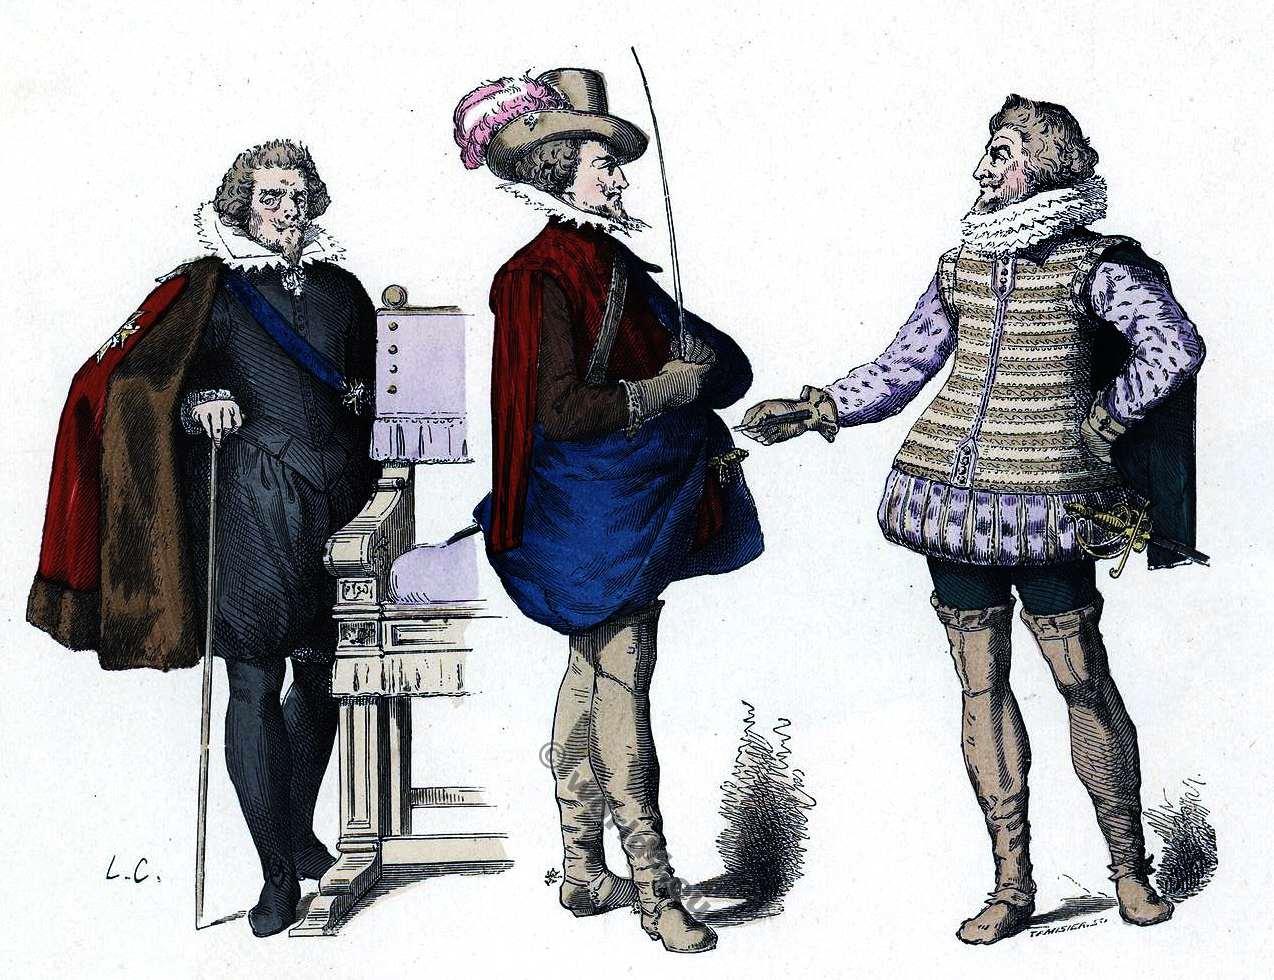 Maréchal, Bellegarde, Écuyer, Baroque, Nobility, French, costume, fashion, dress,